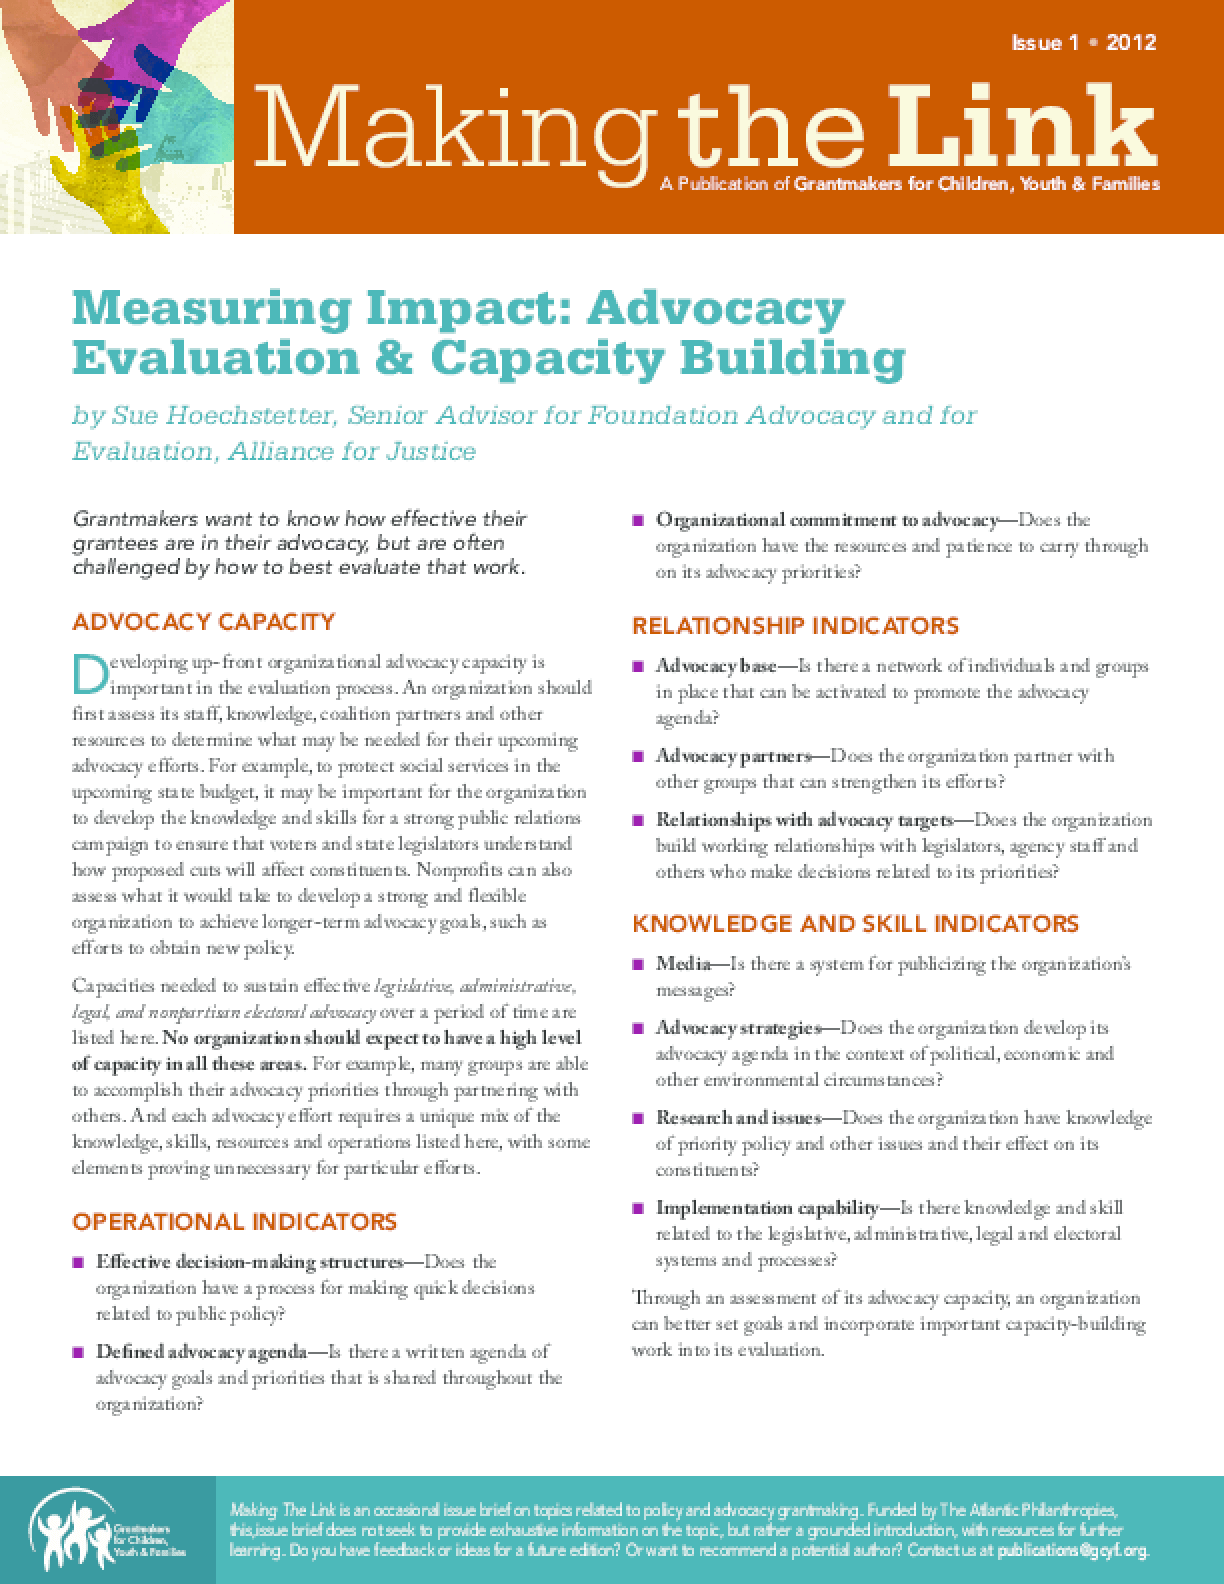 Measuring Impact: Advocacy Evaluation & Capacity Building